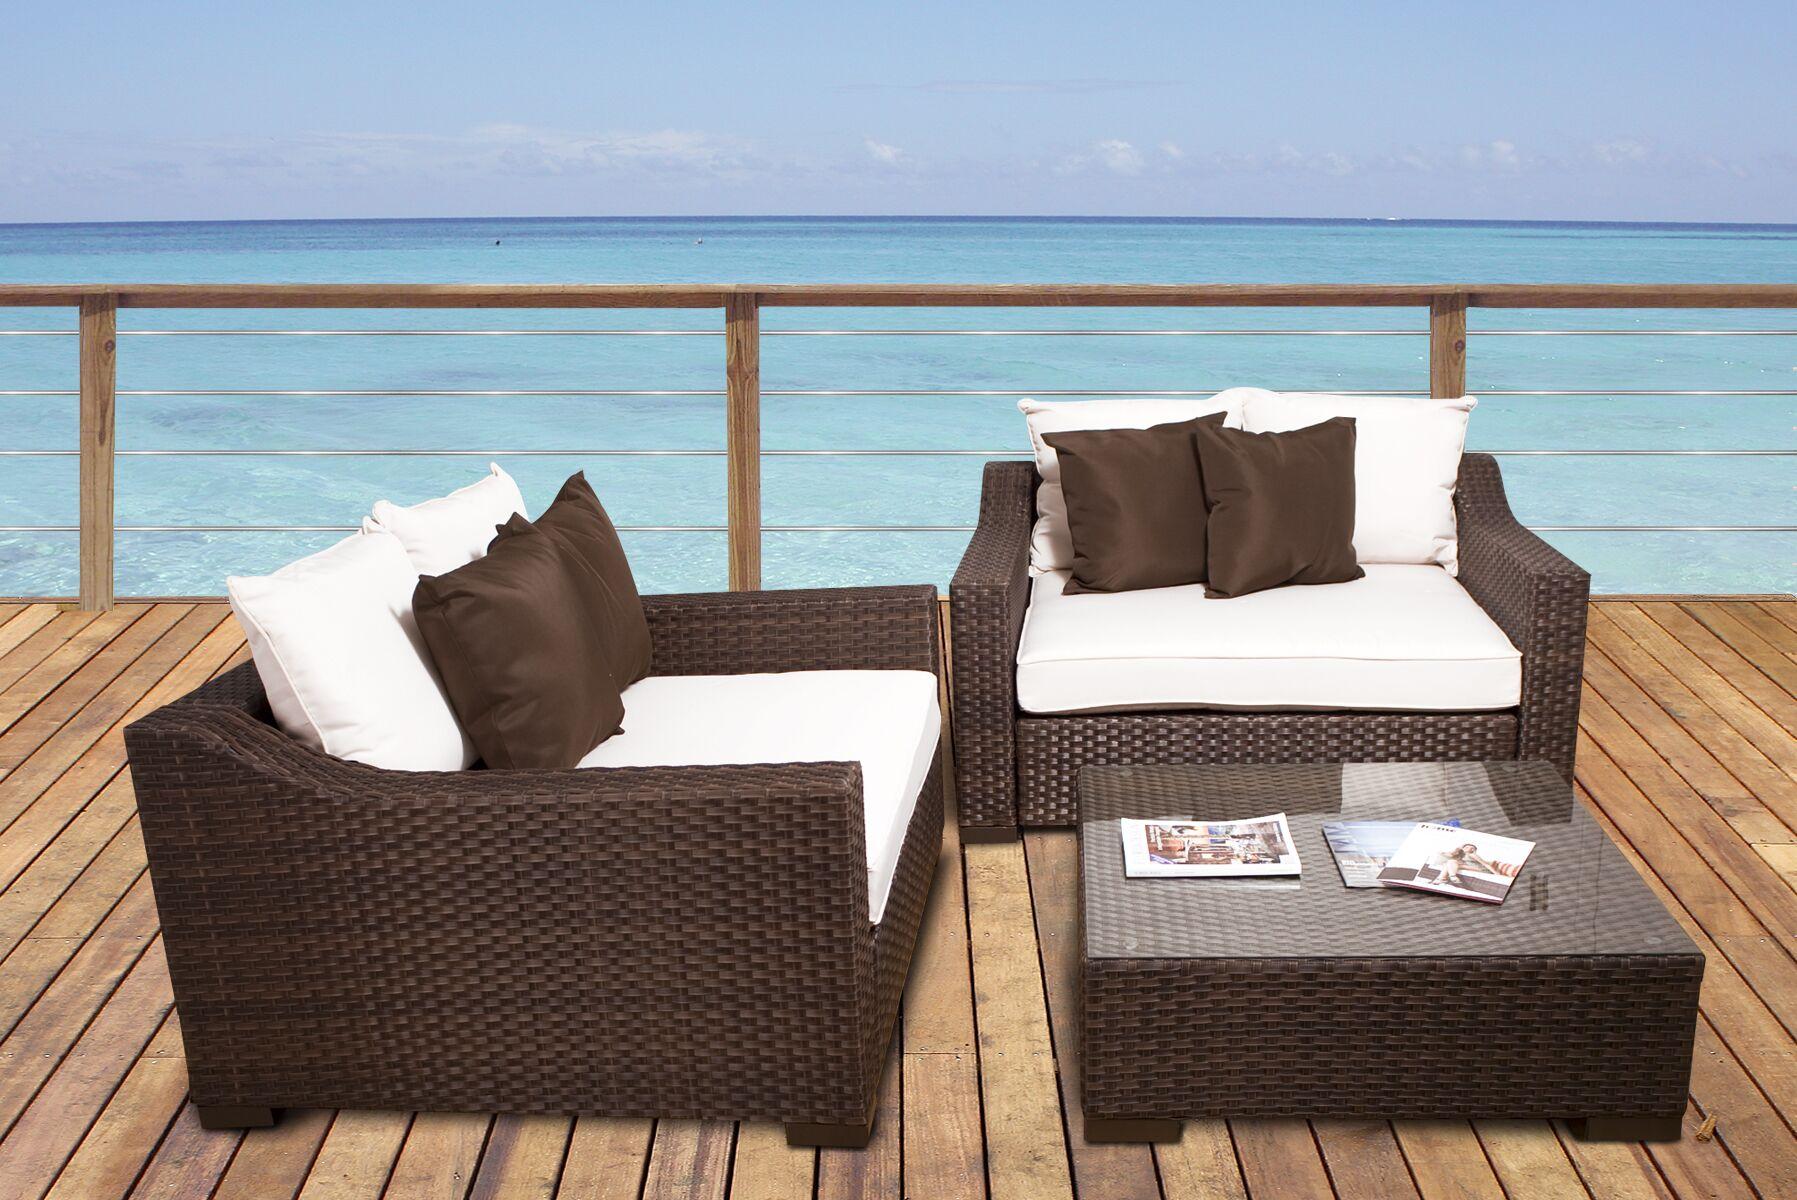 Jermal Wicker 3 Piece Rattan Sunbrella Conversation Set with Cushions Cushion Color: Off-White